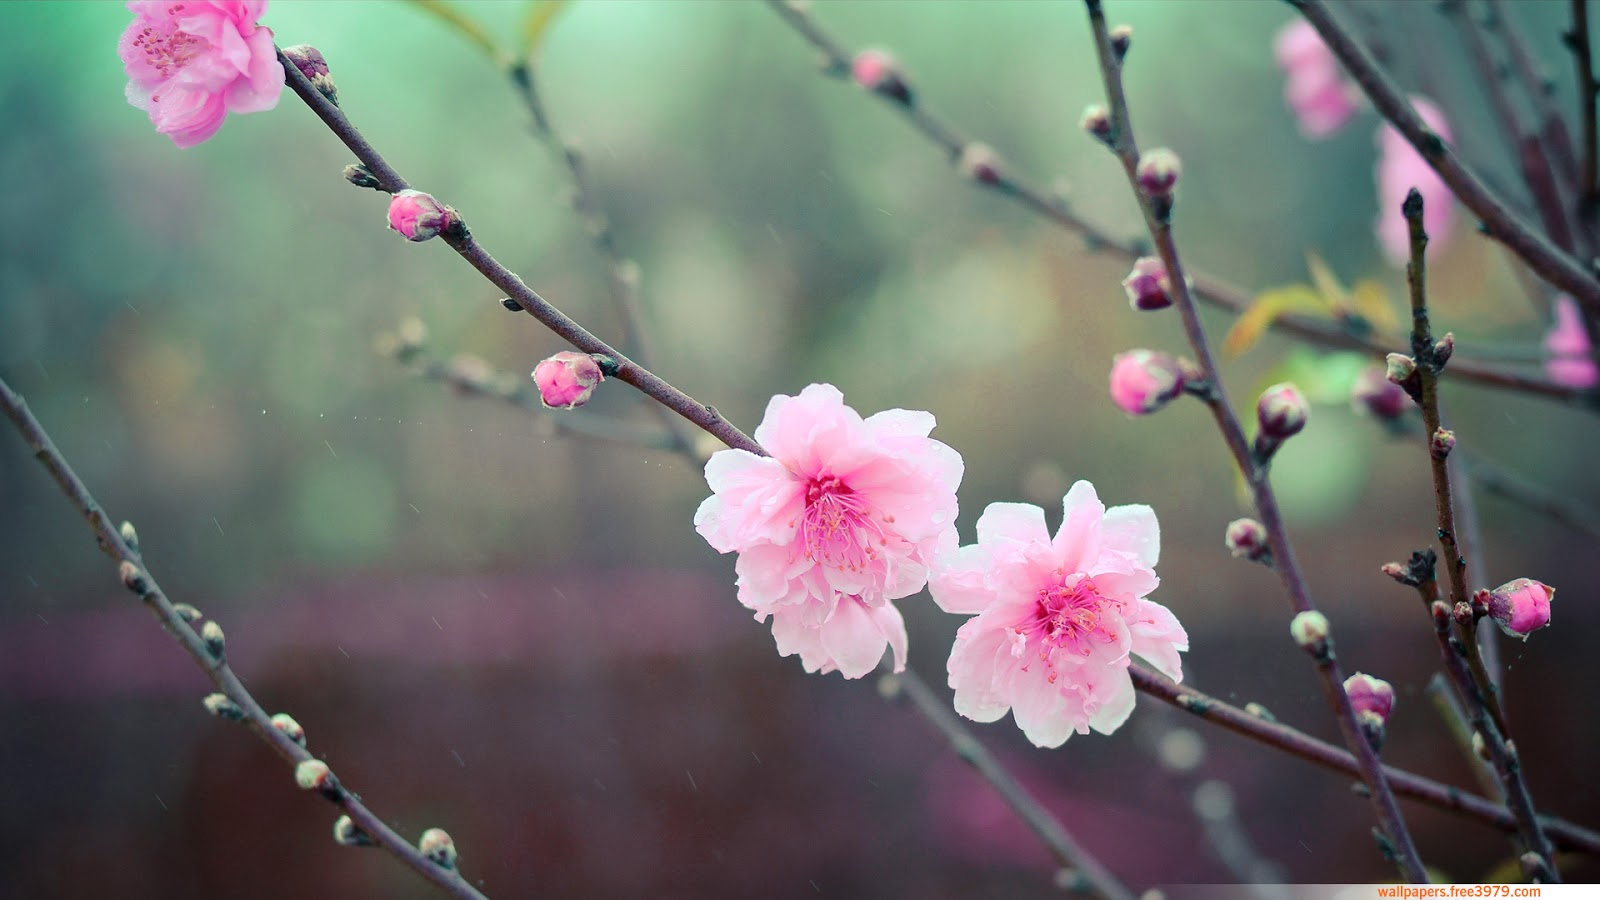 Free Download Japanese Cherry Blossom Flower Vietnam Flowers Cherry Blossom Floral 1600x900 For Your Desktop Mobile Tablet Explore 37 Japanese Cherry Blossom Wallpaper 1920x1080 Bing Cherry Blossom Wallpaper Japanese